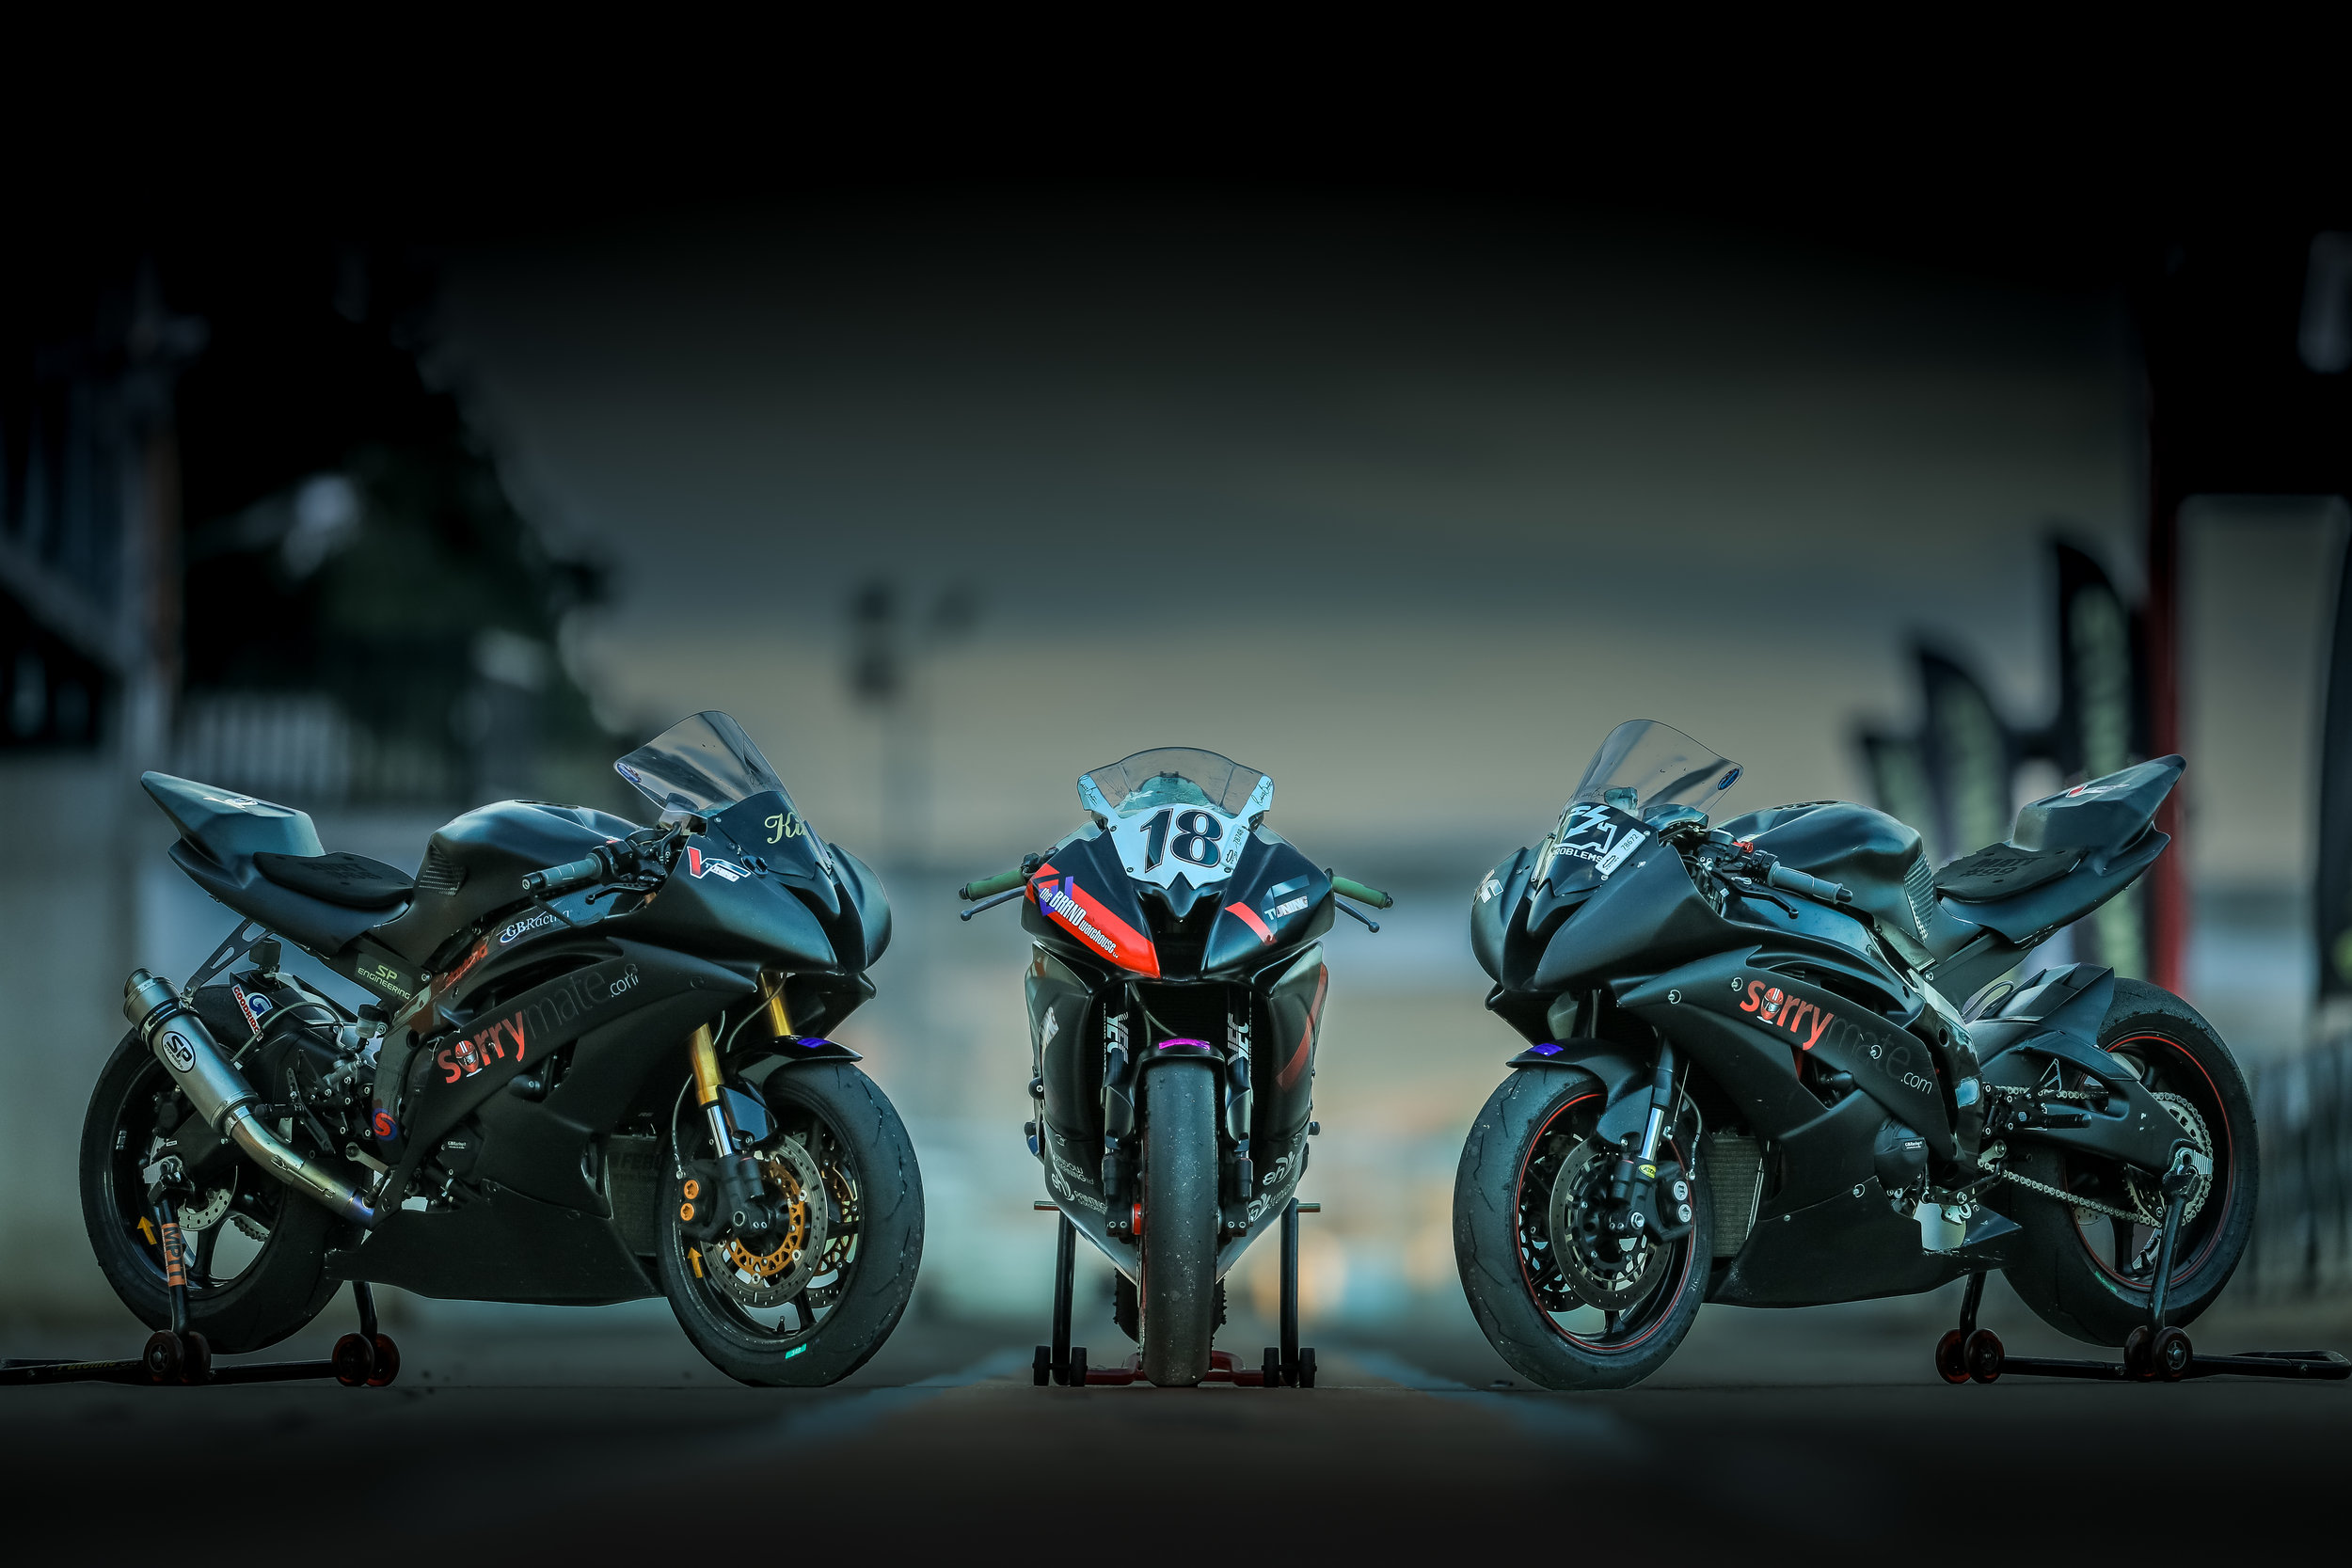 bikes2 (1 of 1).jpg